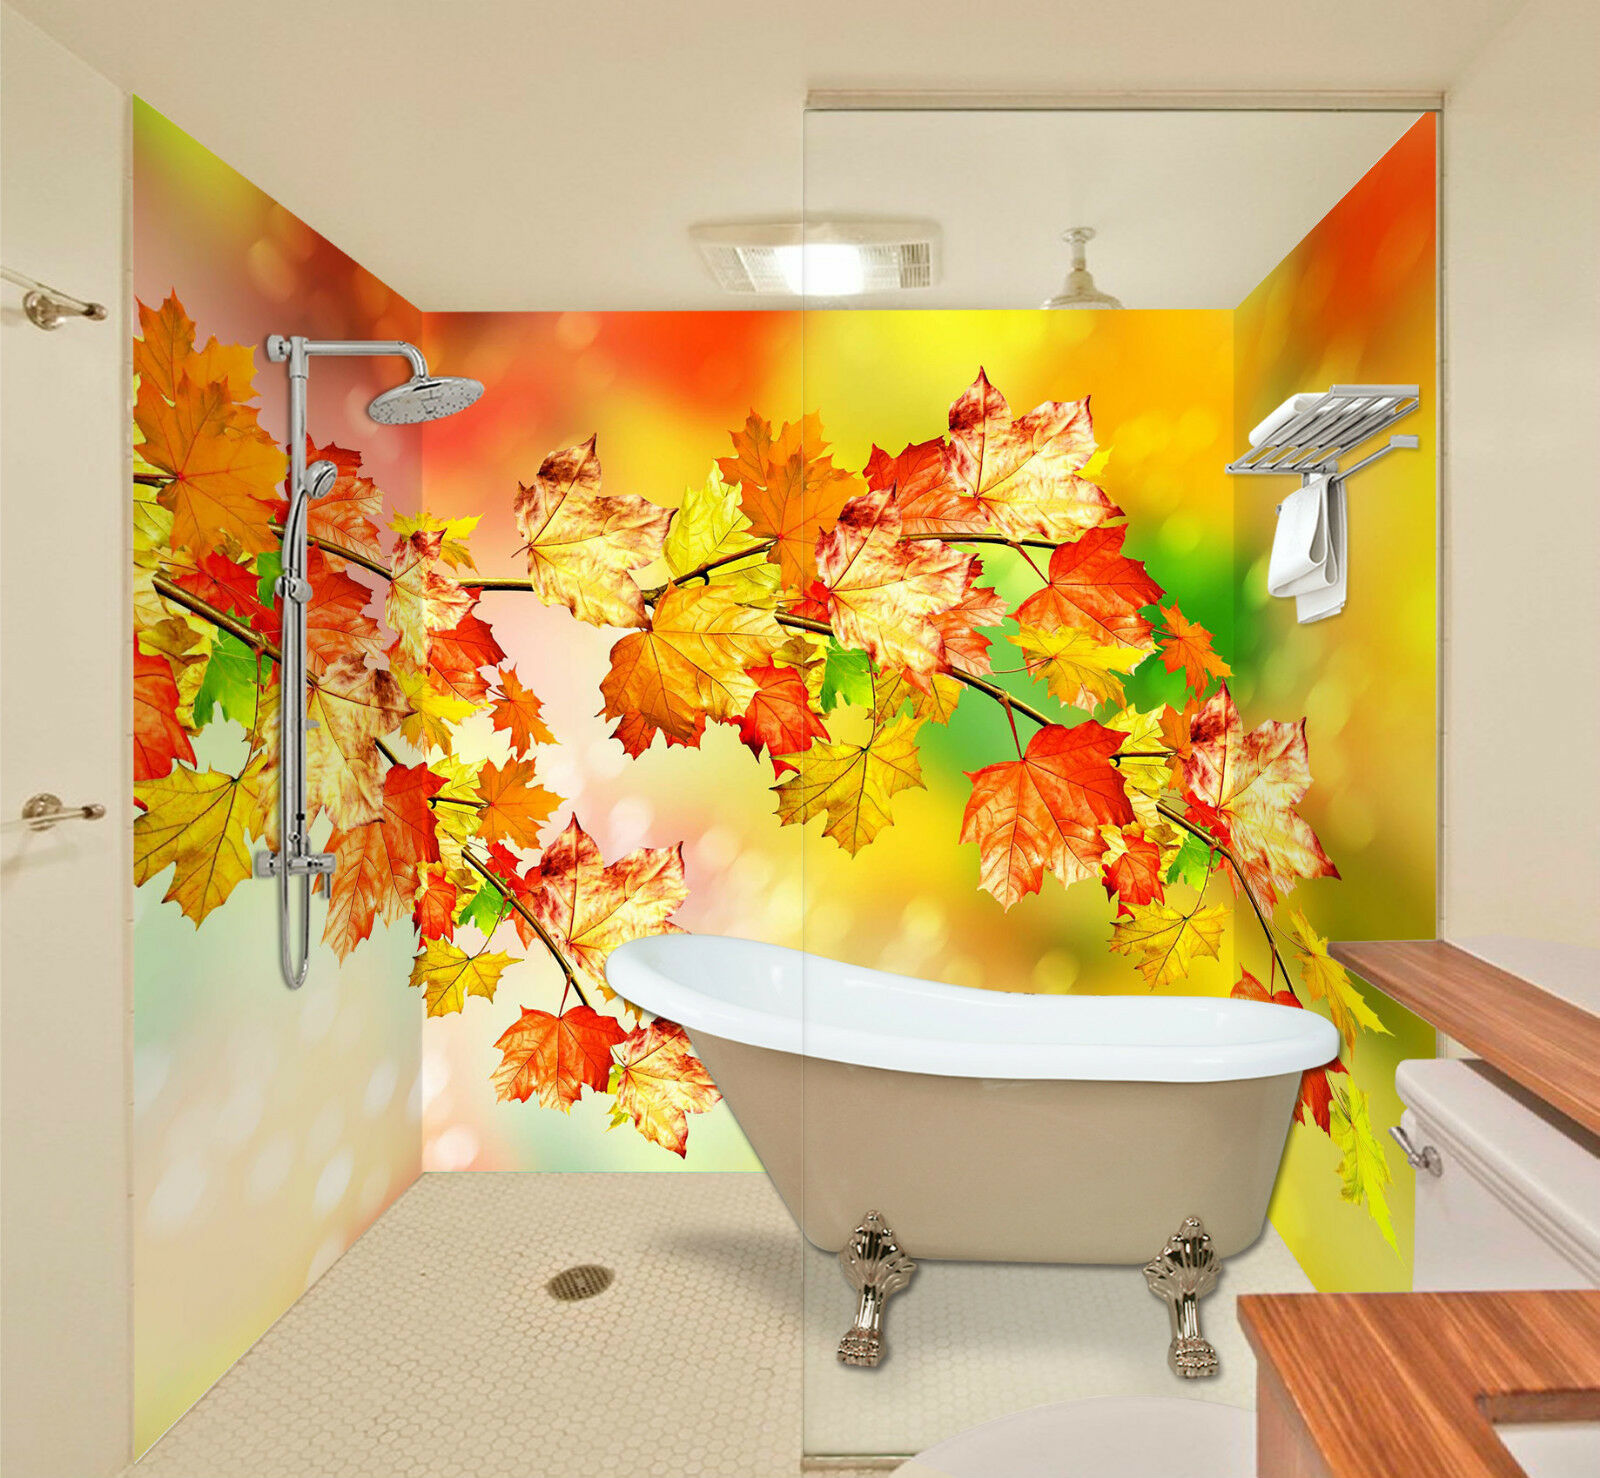 3D Shining Leaves 0017 WallPaper Bathroom Print Decal Wall Deco AJ WALLPAPER CA